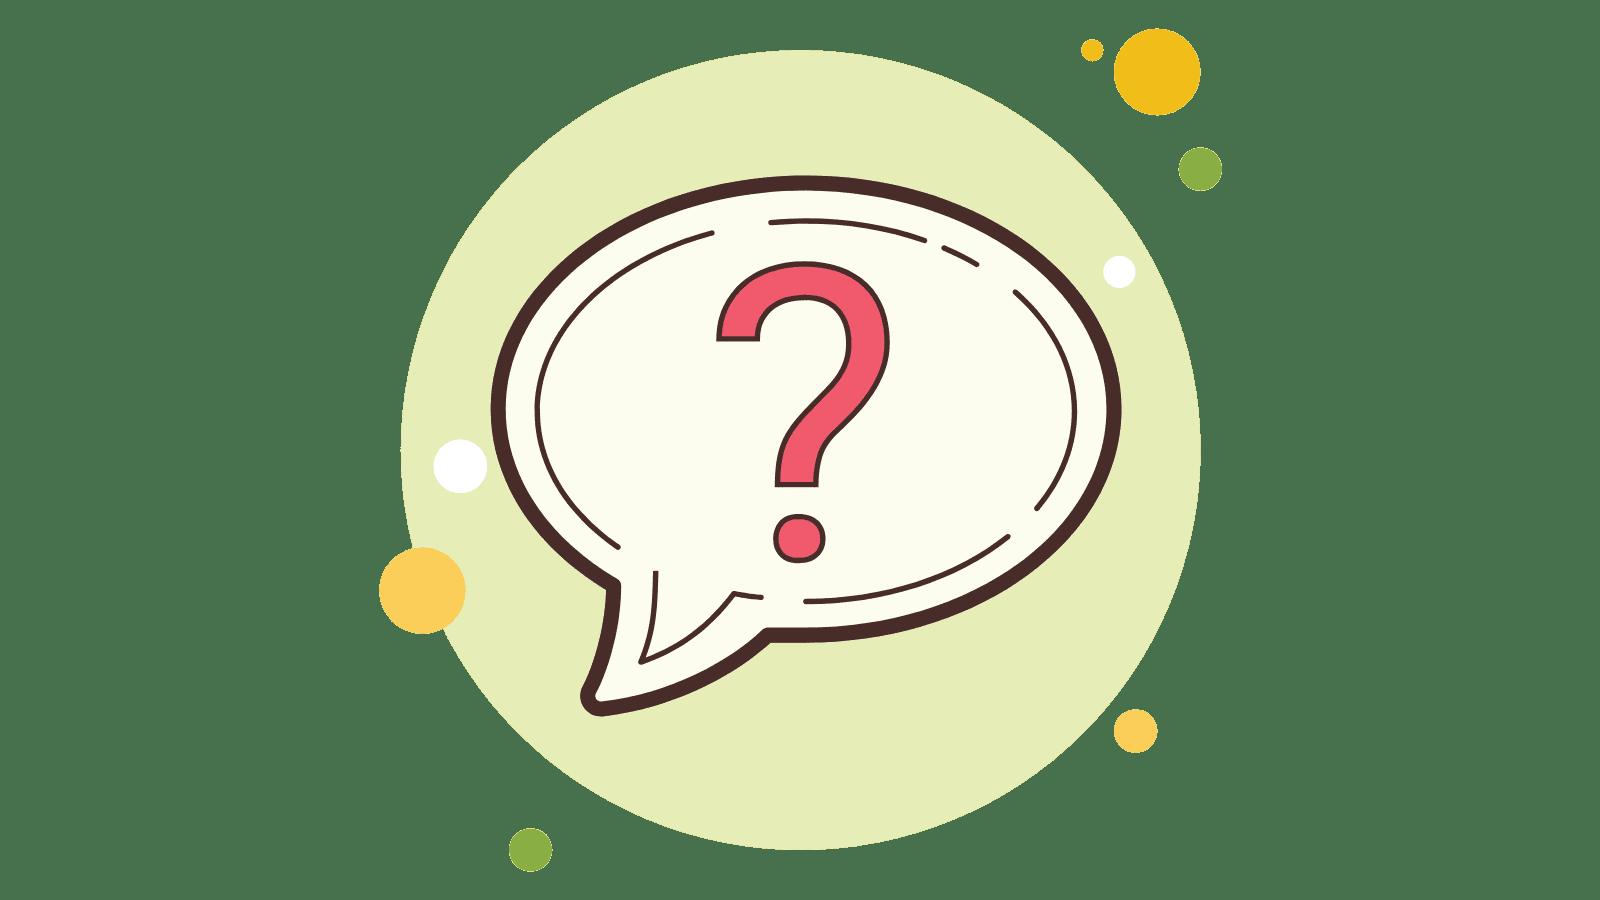 FAQ clipart